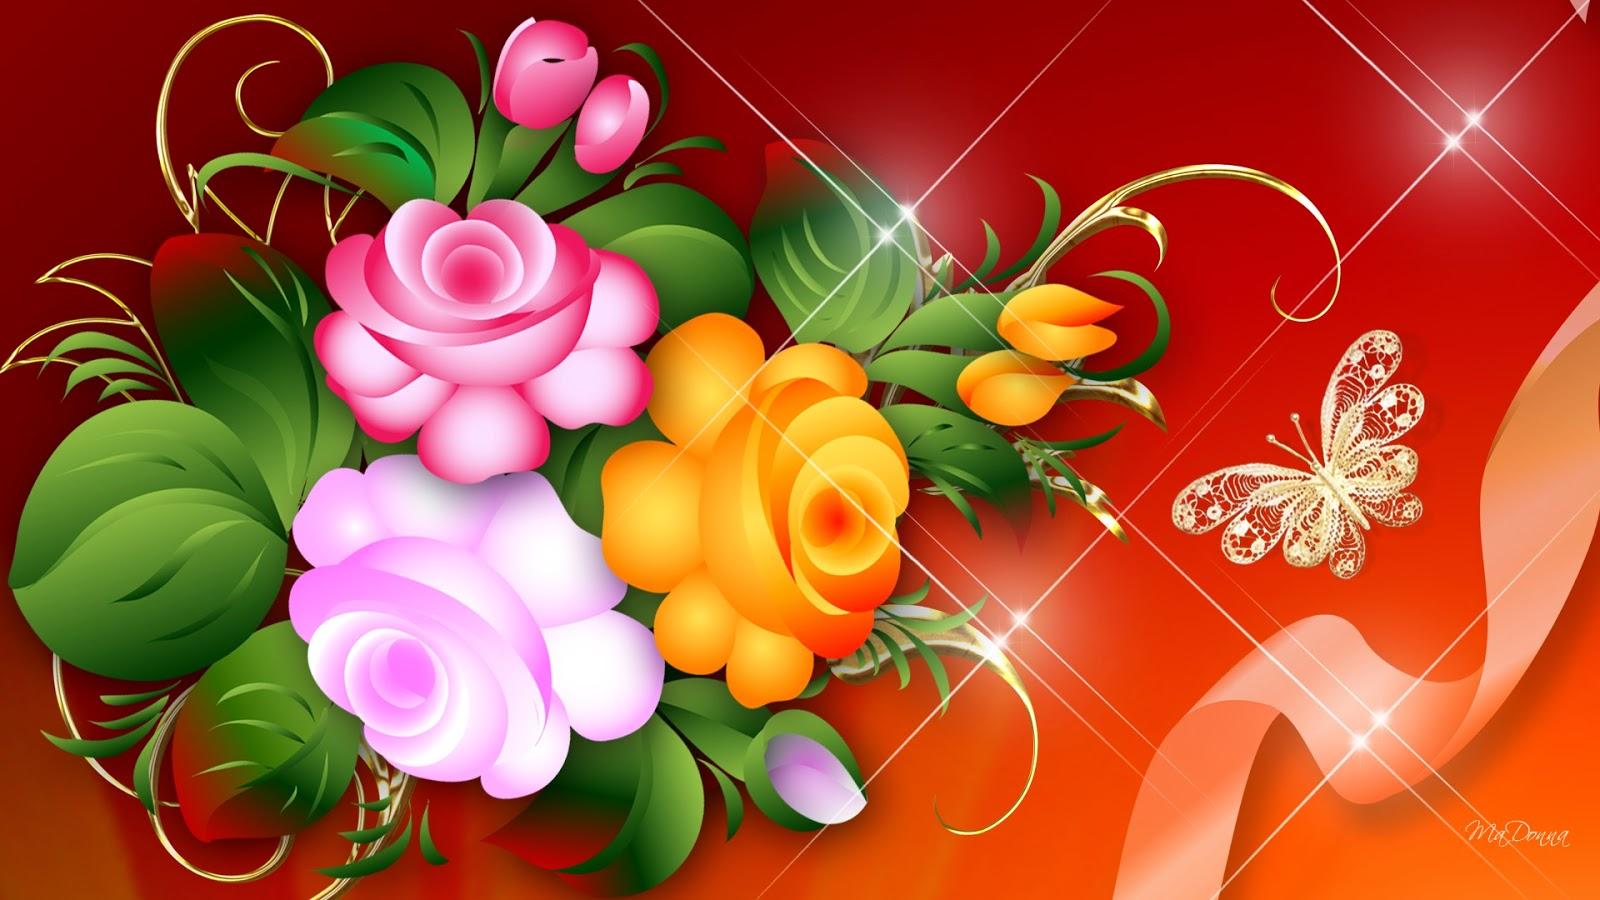 Beautiful Flower Wallpaper   34 Group Wallpapers 1600x900